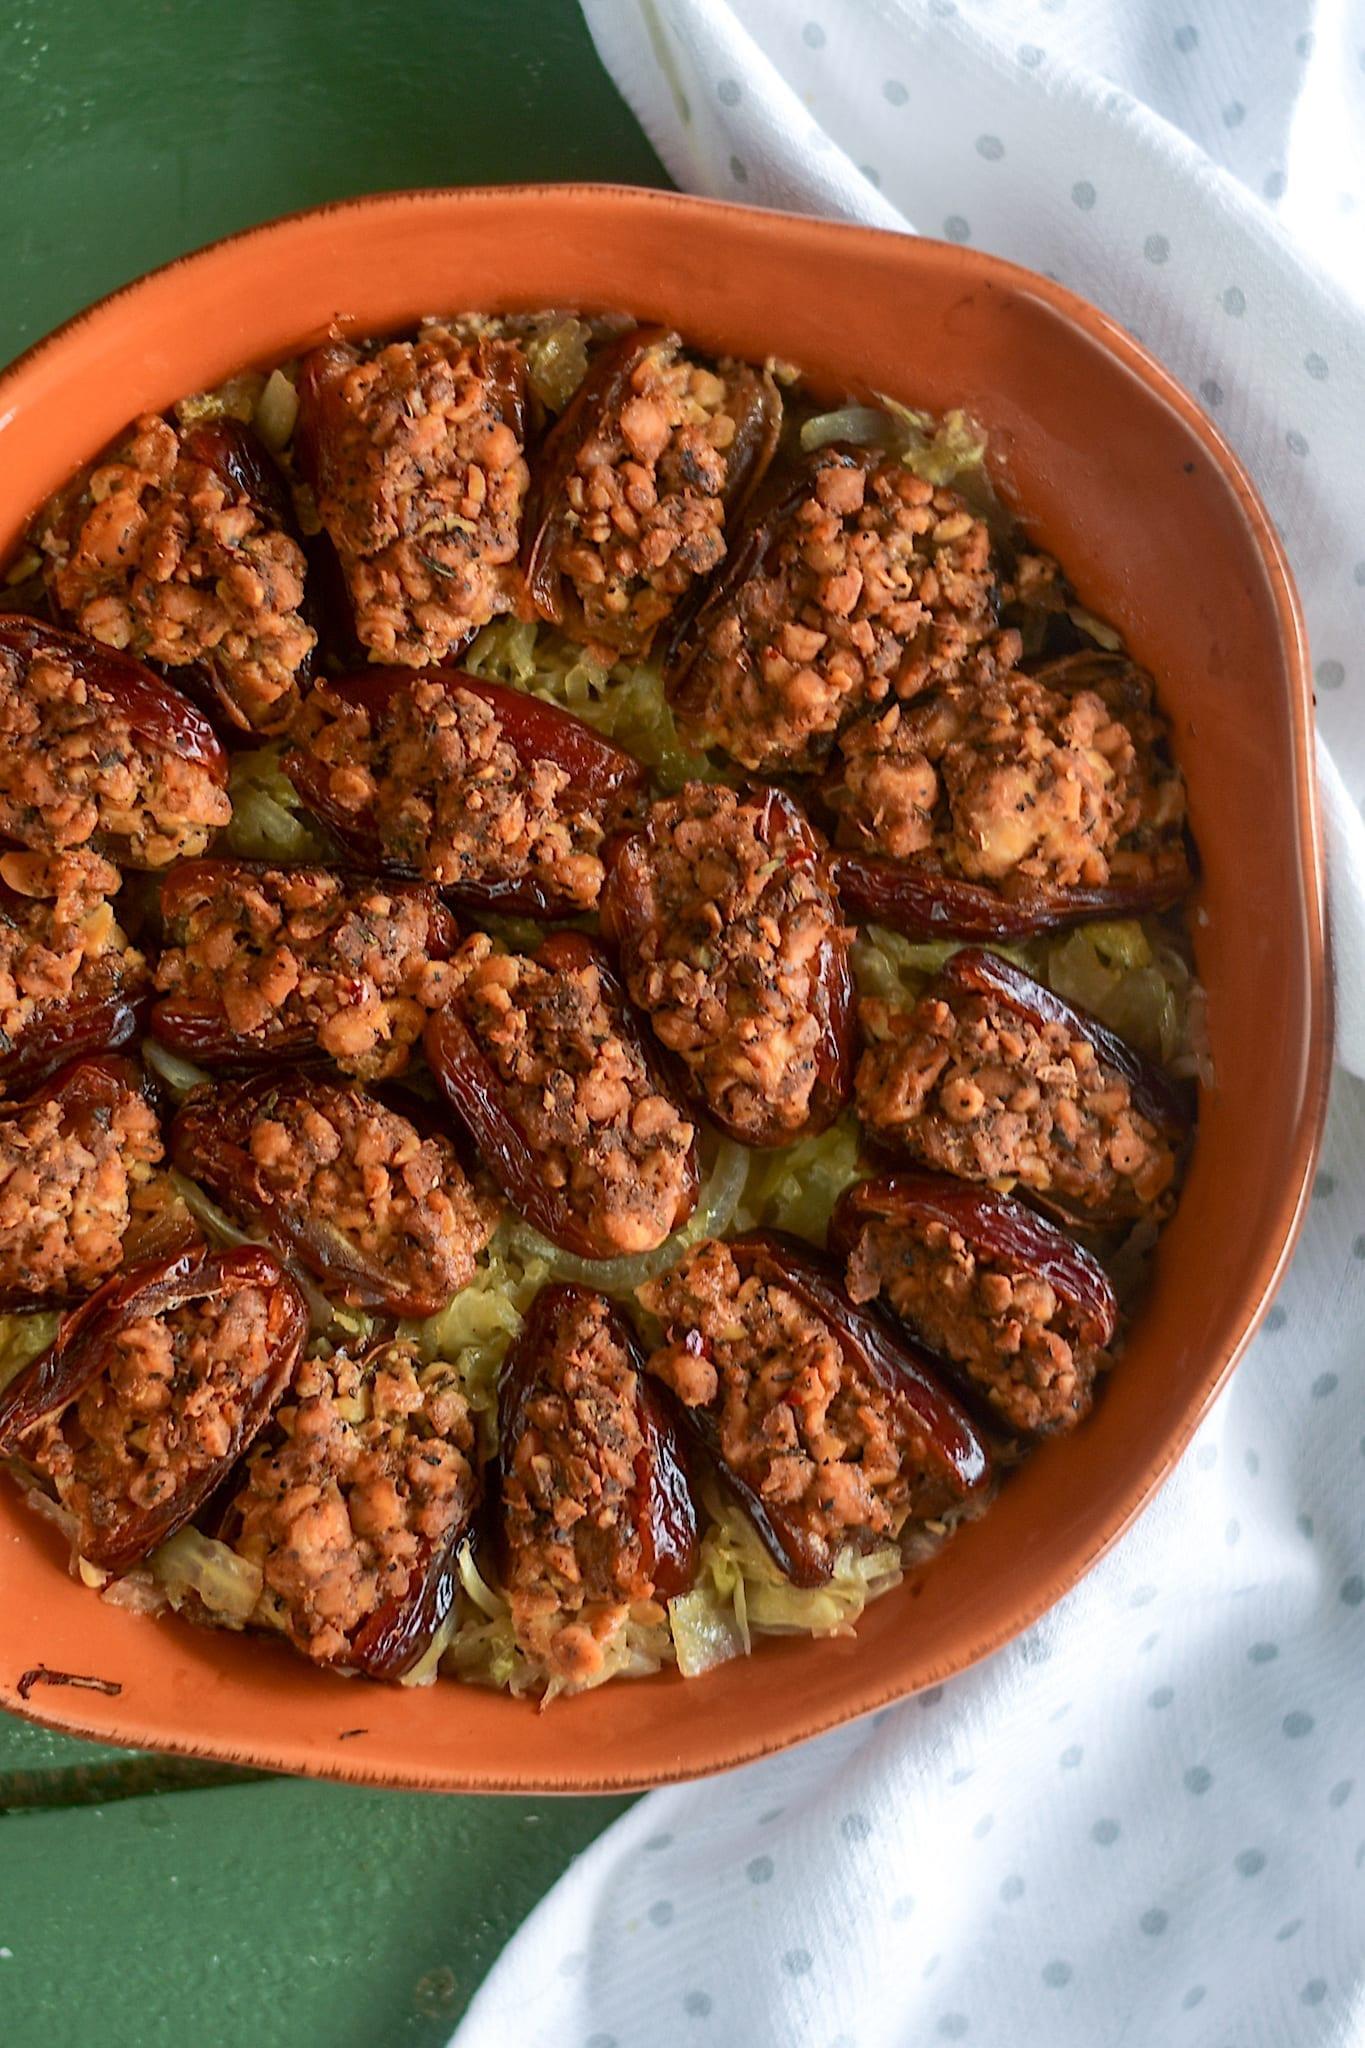 Vegan Holiday Recipes, Sausage Stuffed Dates